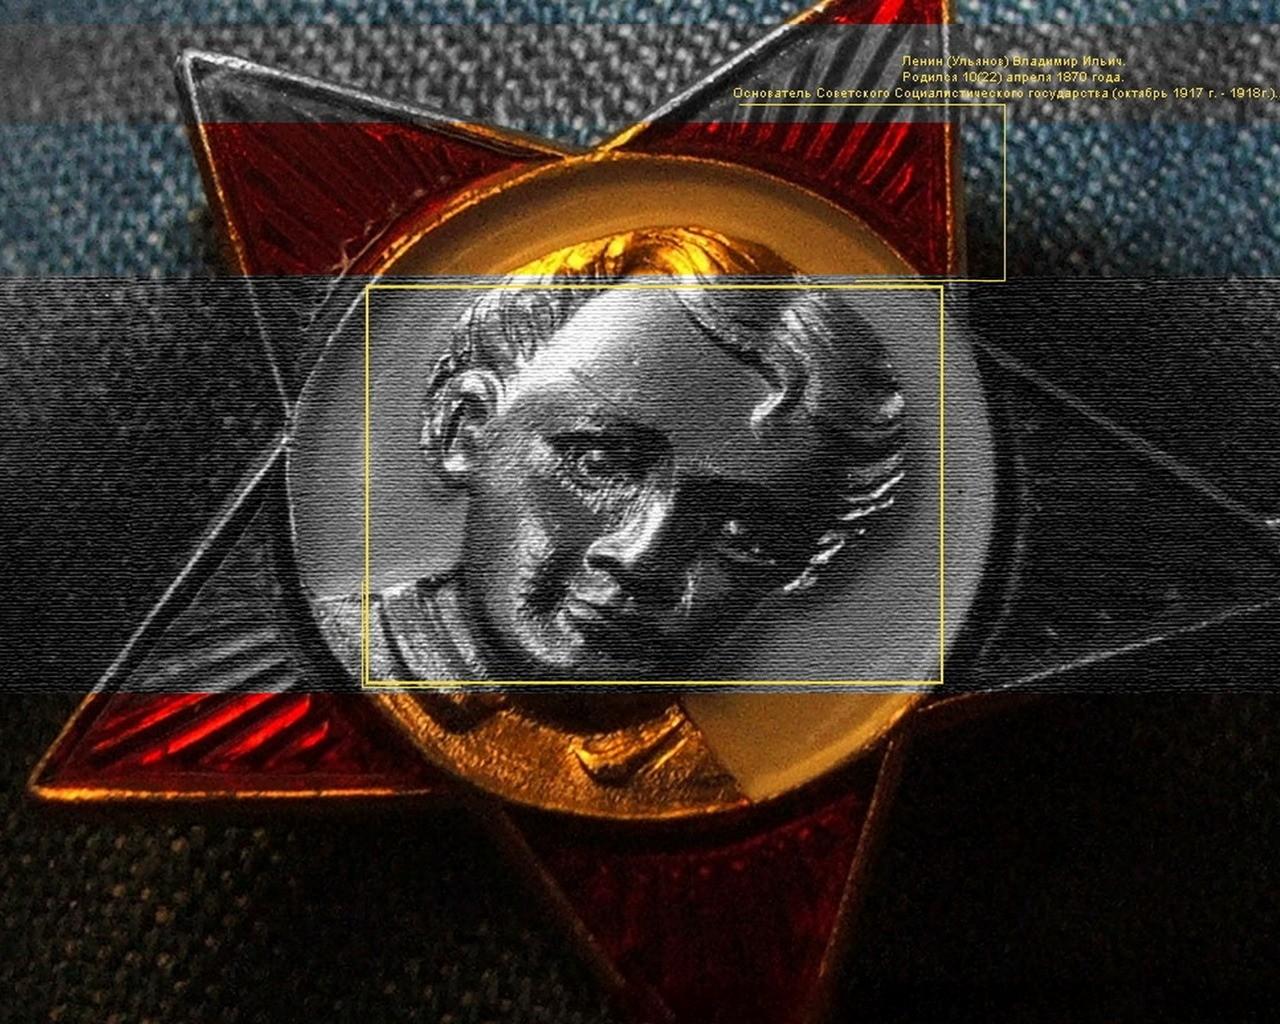 http://1.bp.blogspot.com/-4CljzI12IwA/TyQIfwJFCyI/AAAAAAAAAgk/f850rZuPIvY/s1600/wallpaper-1614654.jpg